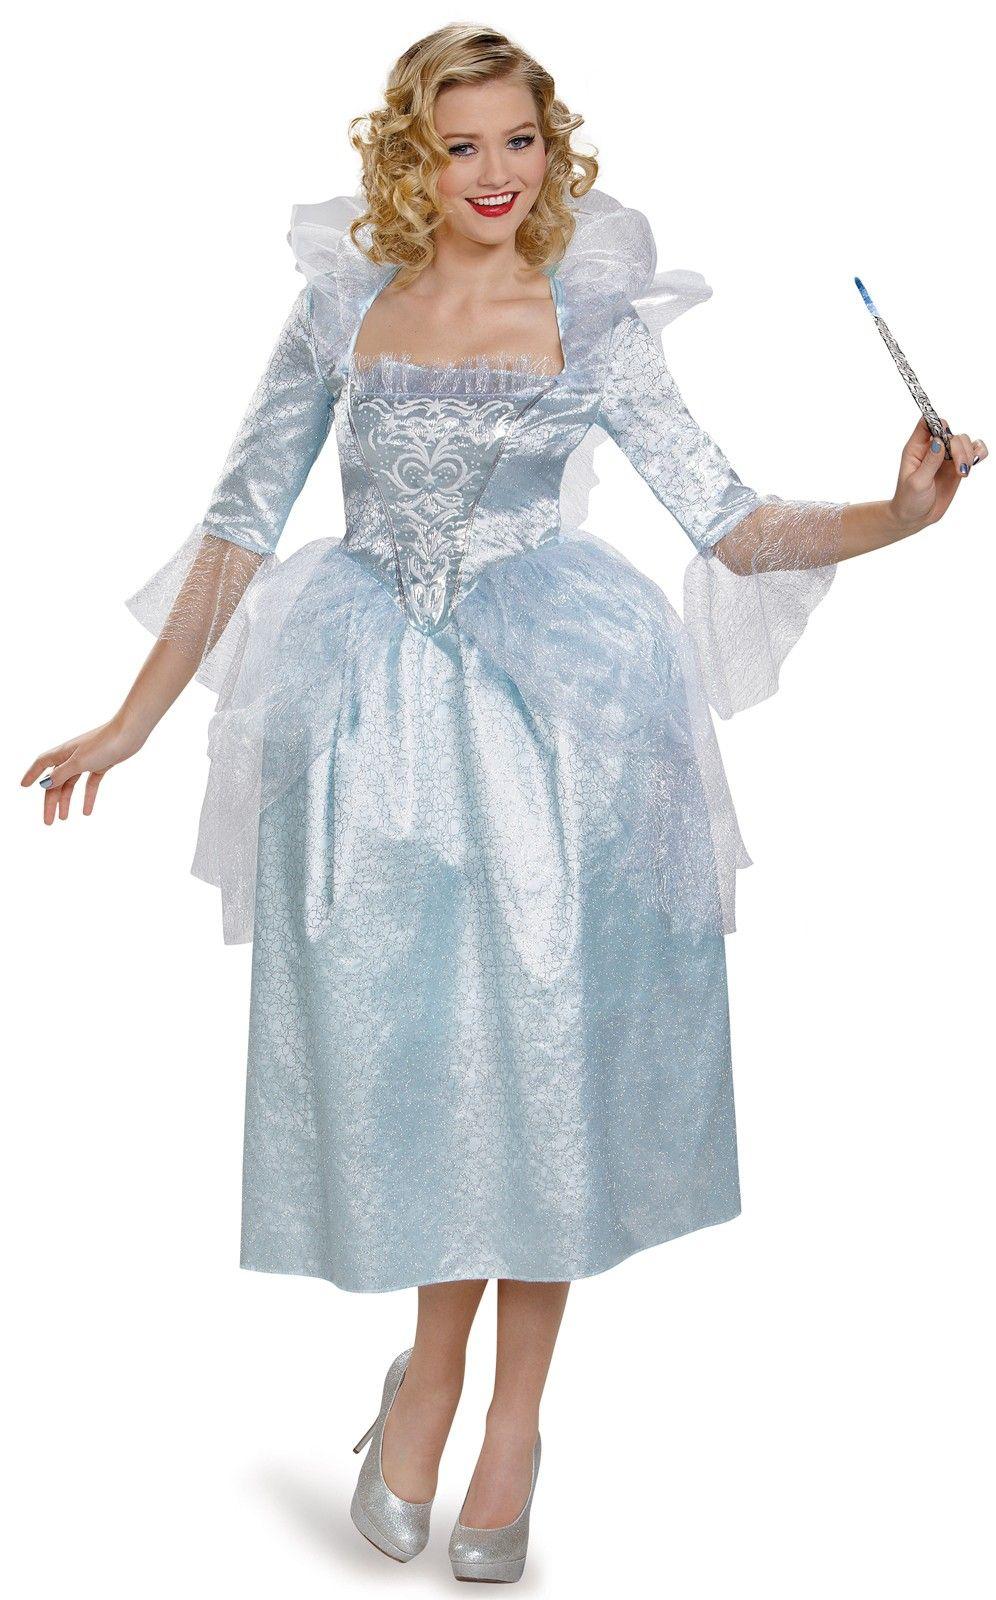 Cinderella Movie Fairy Godmother Deluxe Adult Costume Fairy